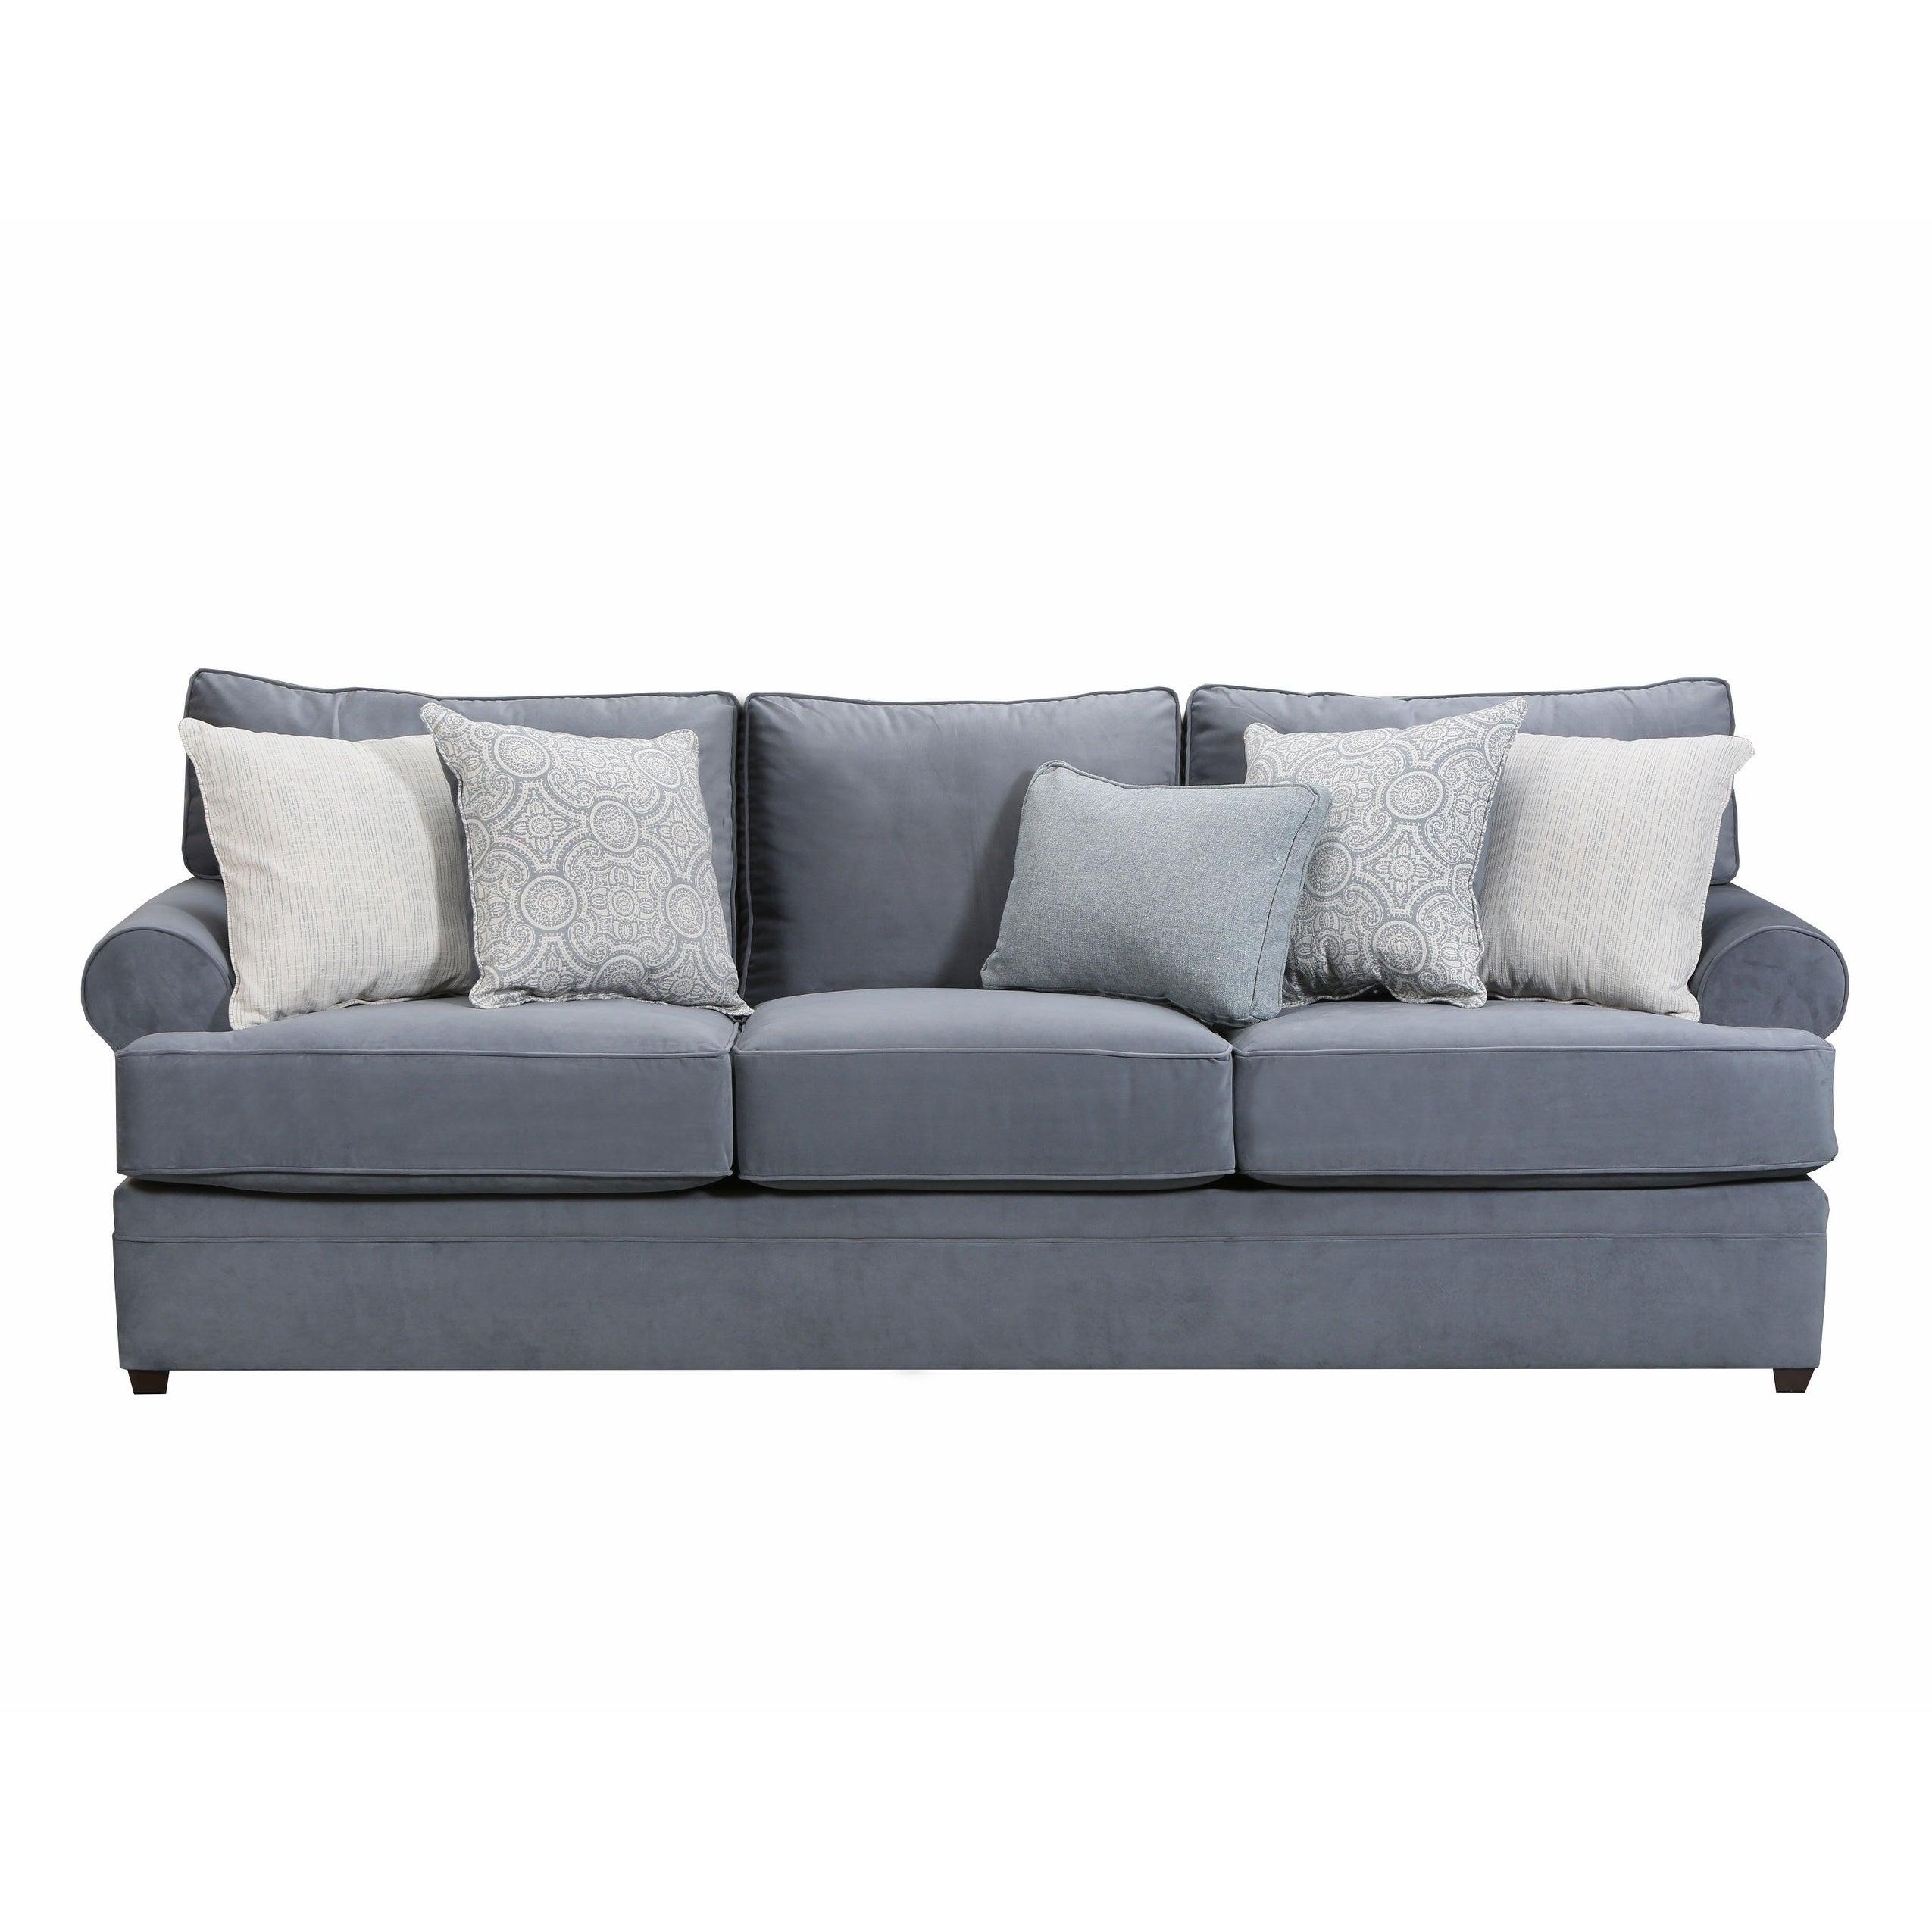 Simmons Upholstery Abington Light Blue Sofa Free Shipping Today 21011703